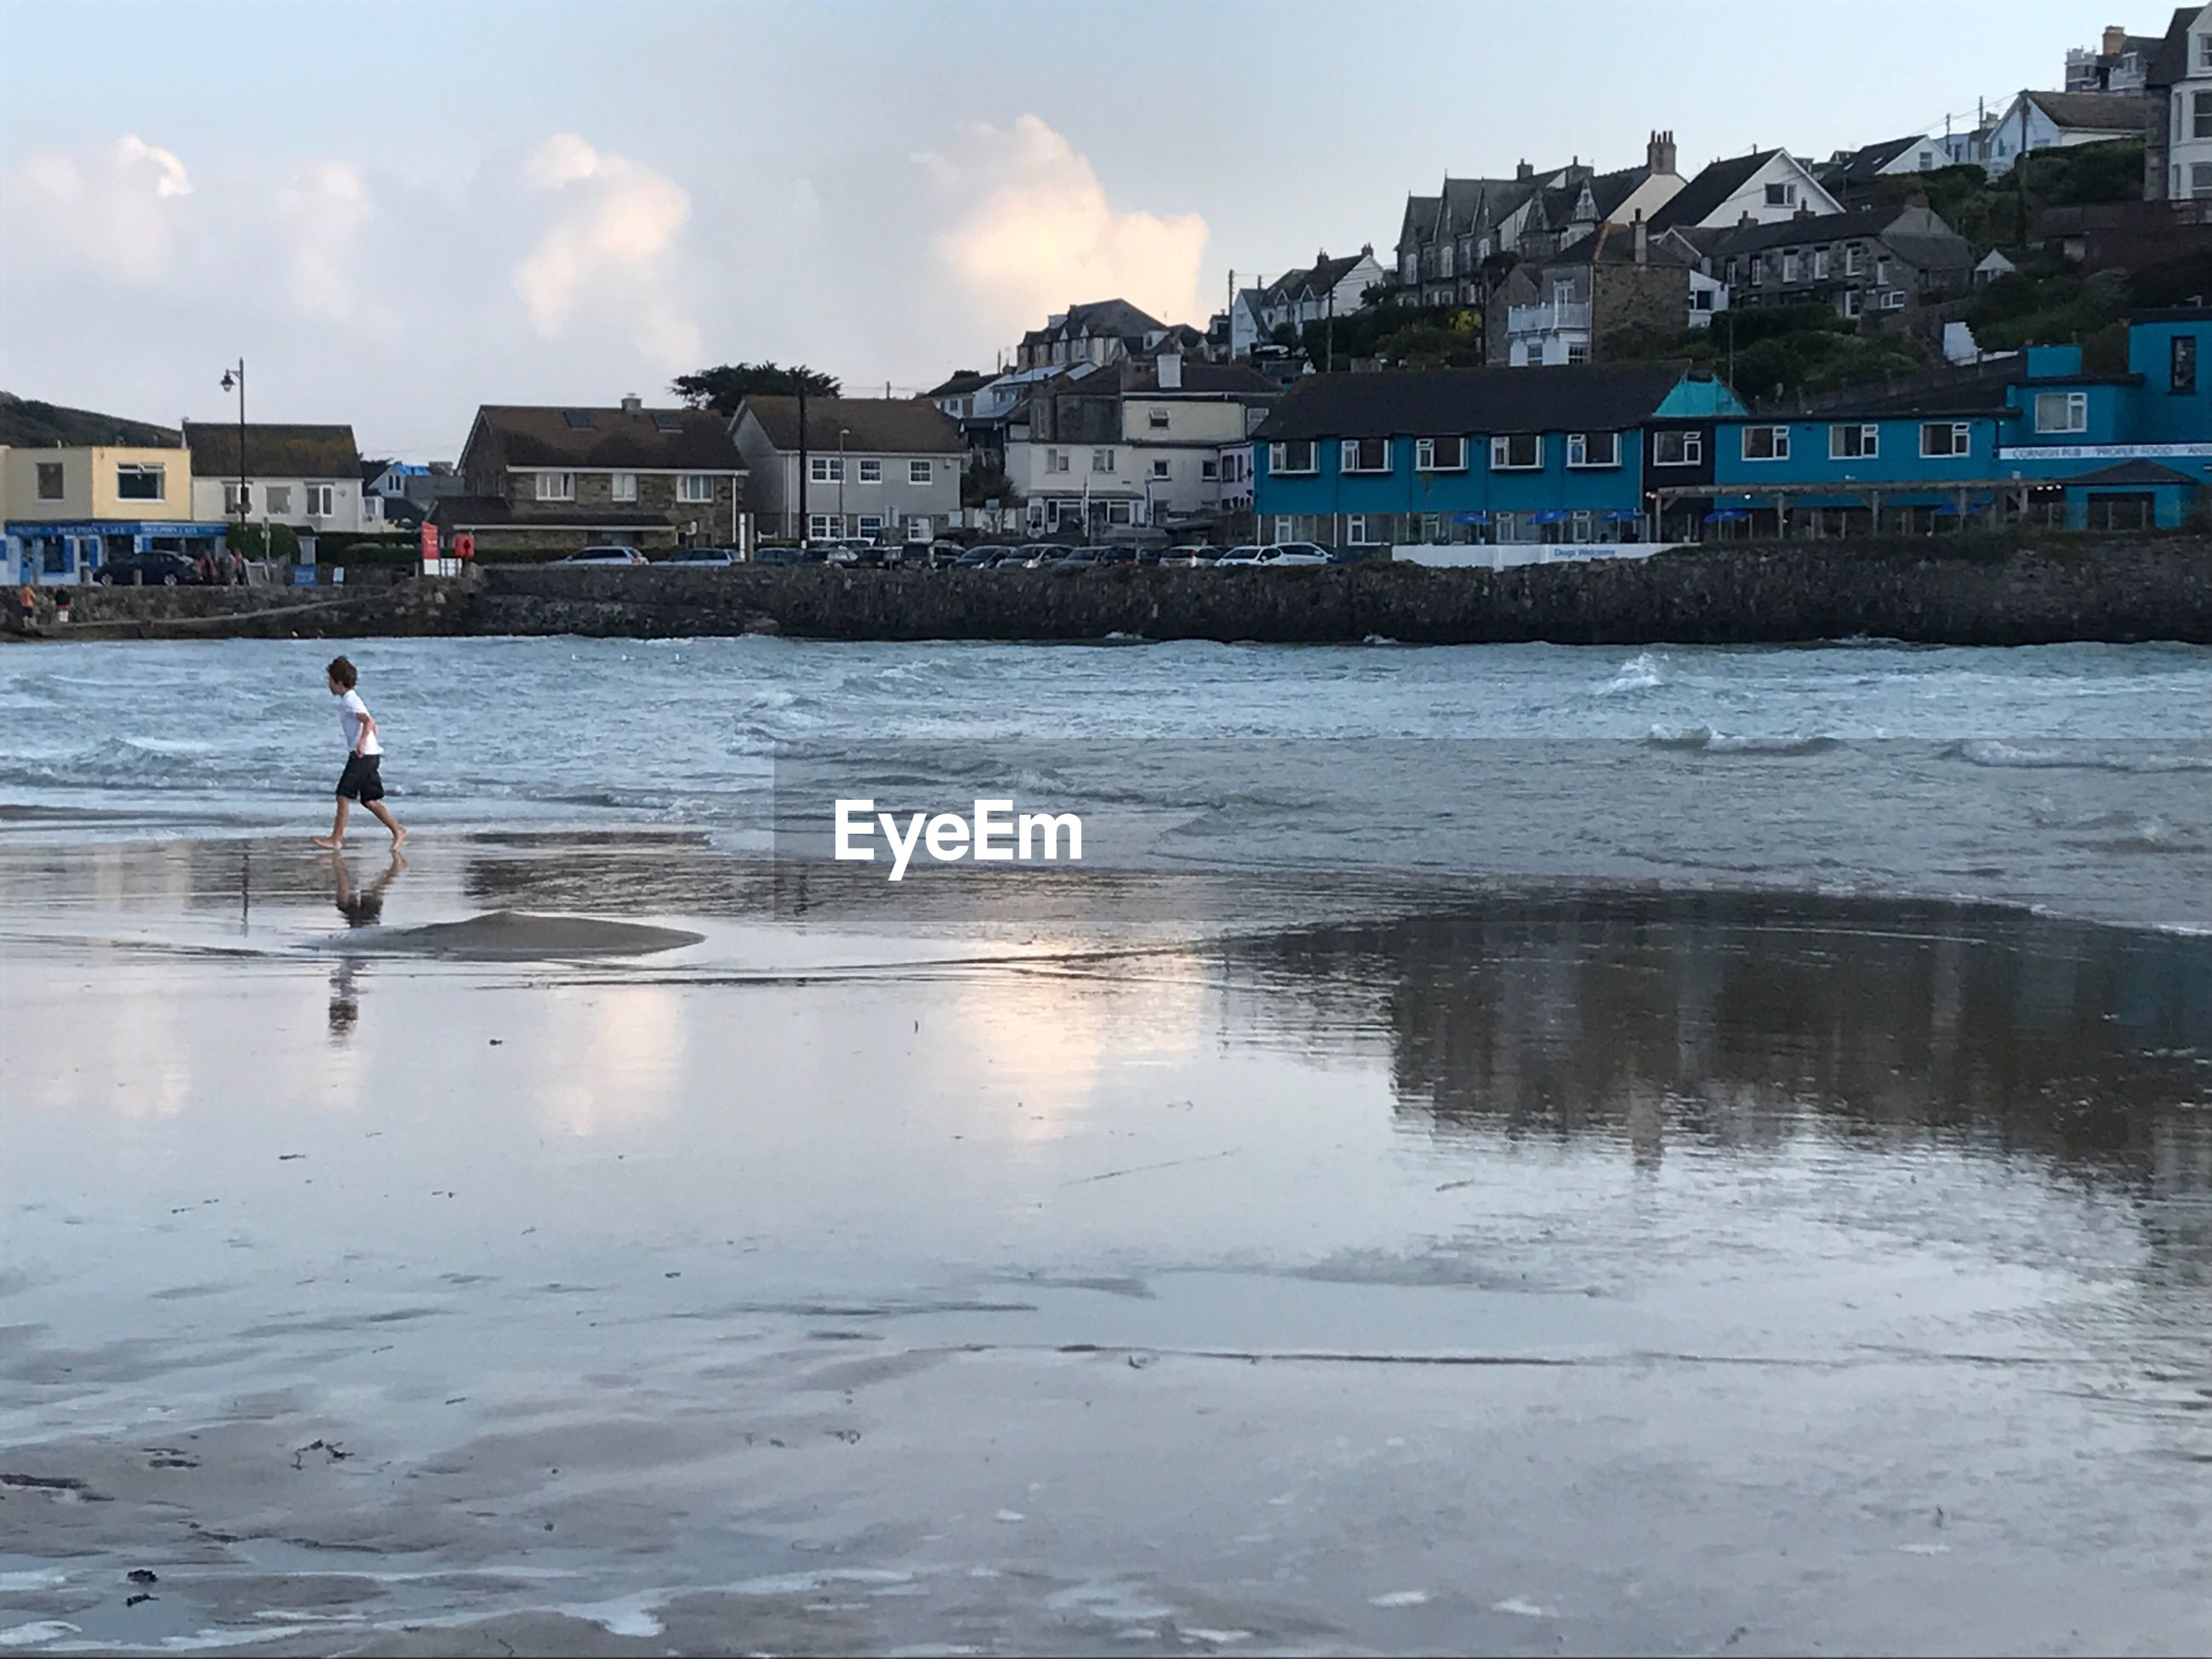 Boy running on shore at beach